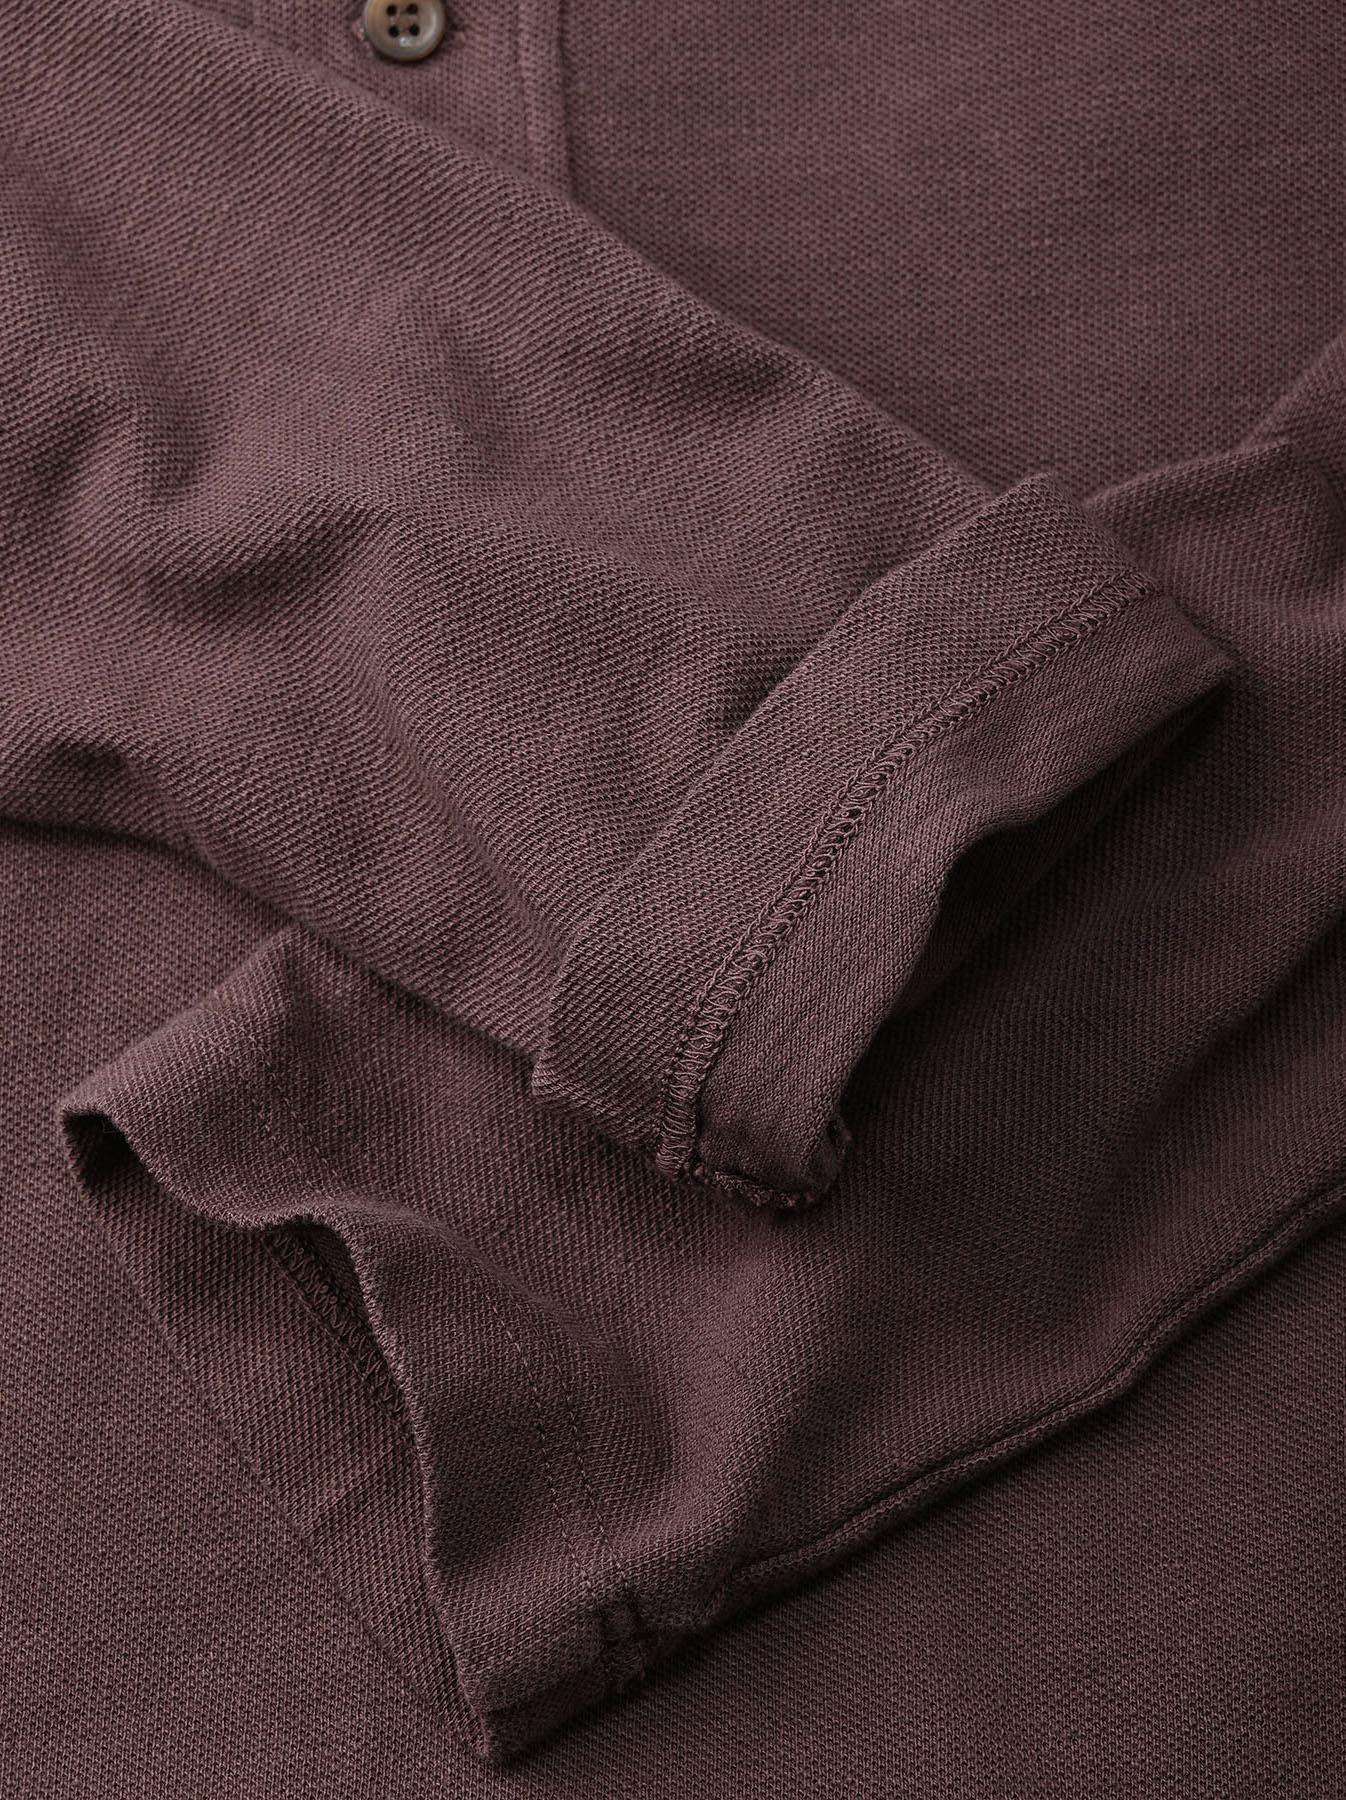 Kanoko Shiokaze Long-sleeved Square Polo Shirt (0521)-11